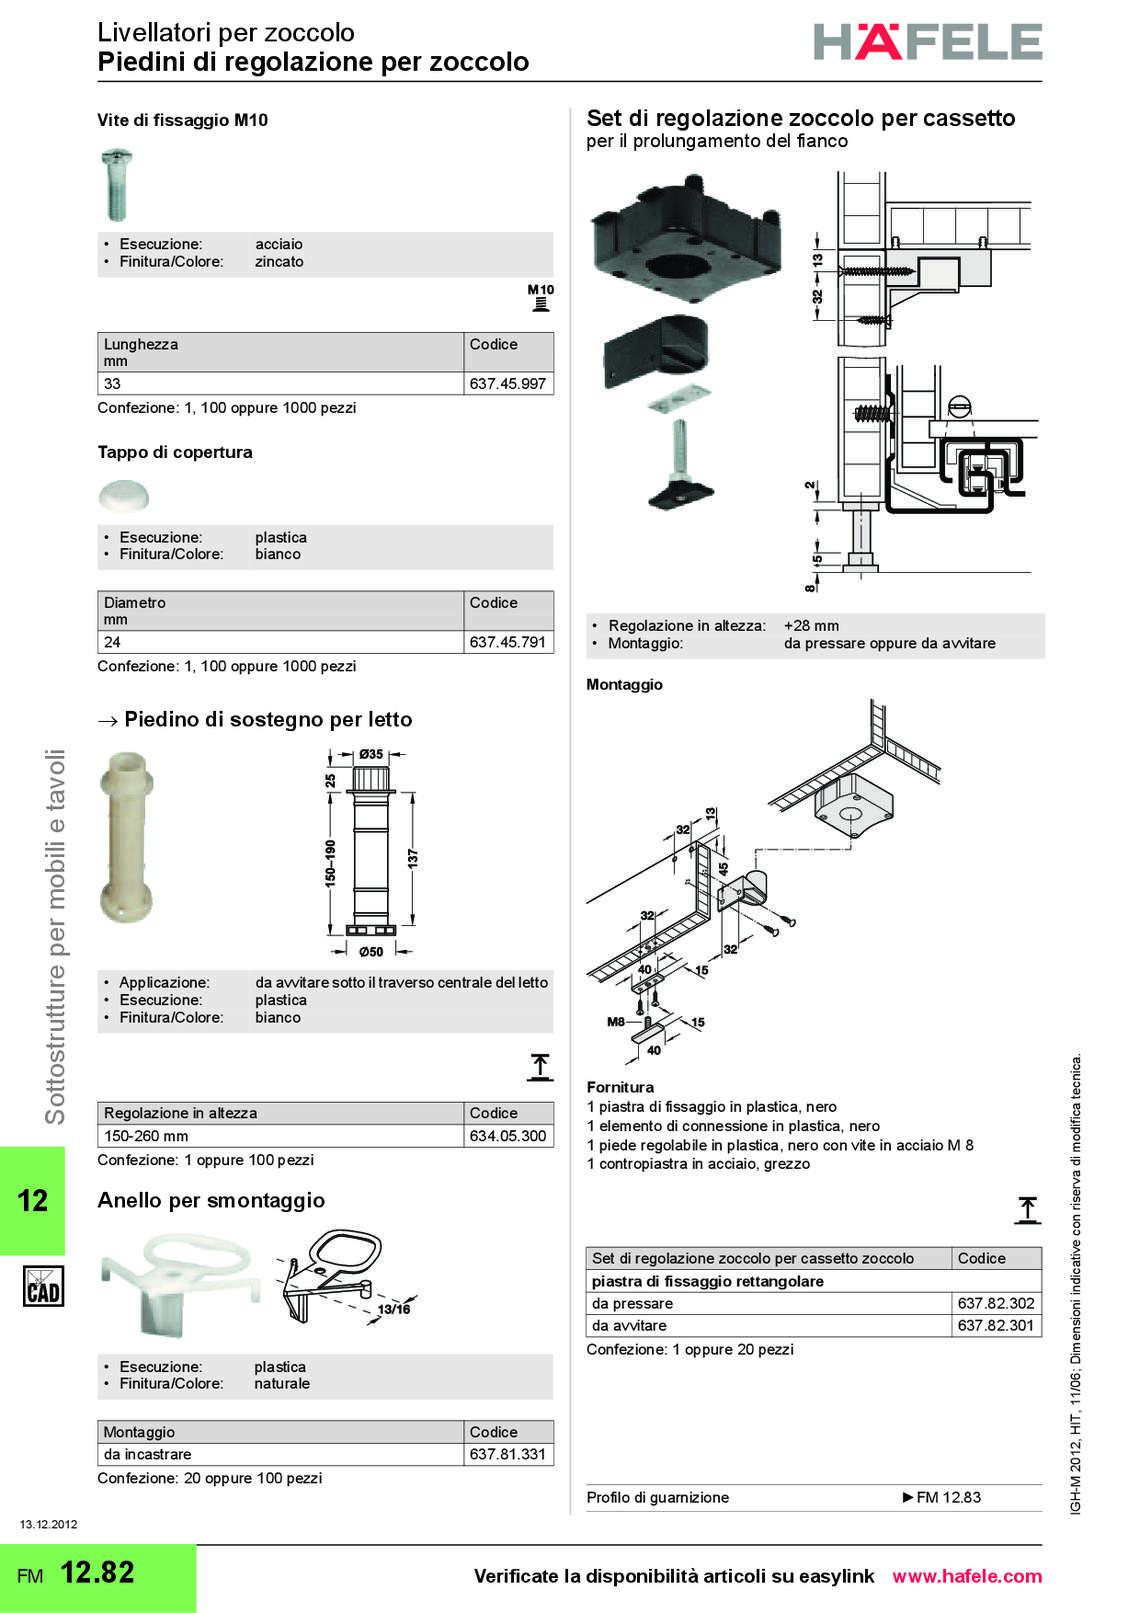 hafele-sottostrutture-per-mobili_83_107.jpg